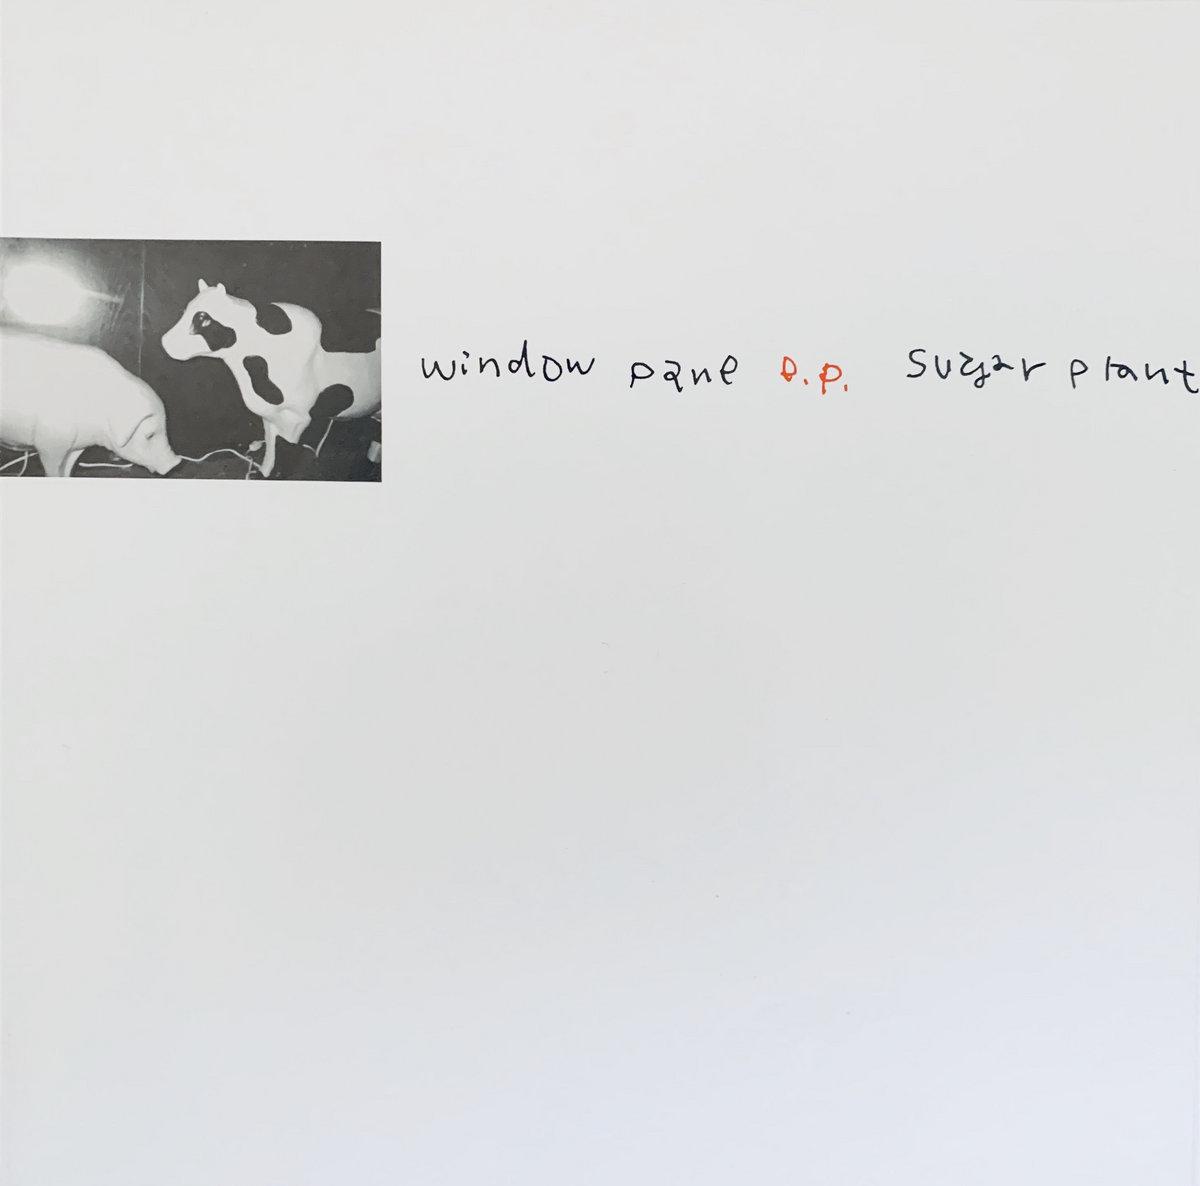 Sugar Plant – Window Pane 7